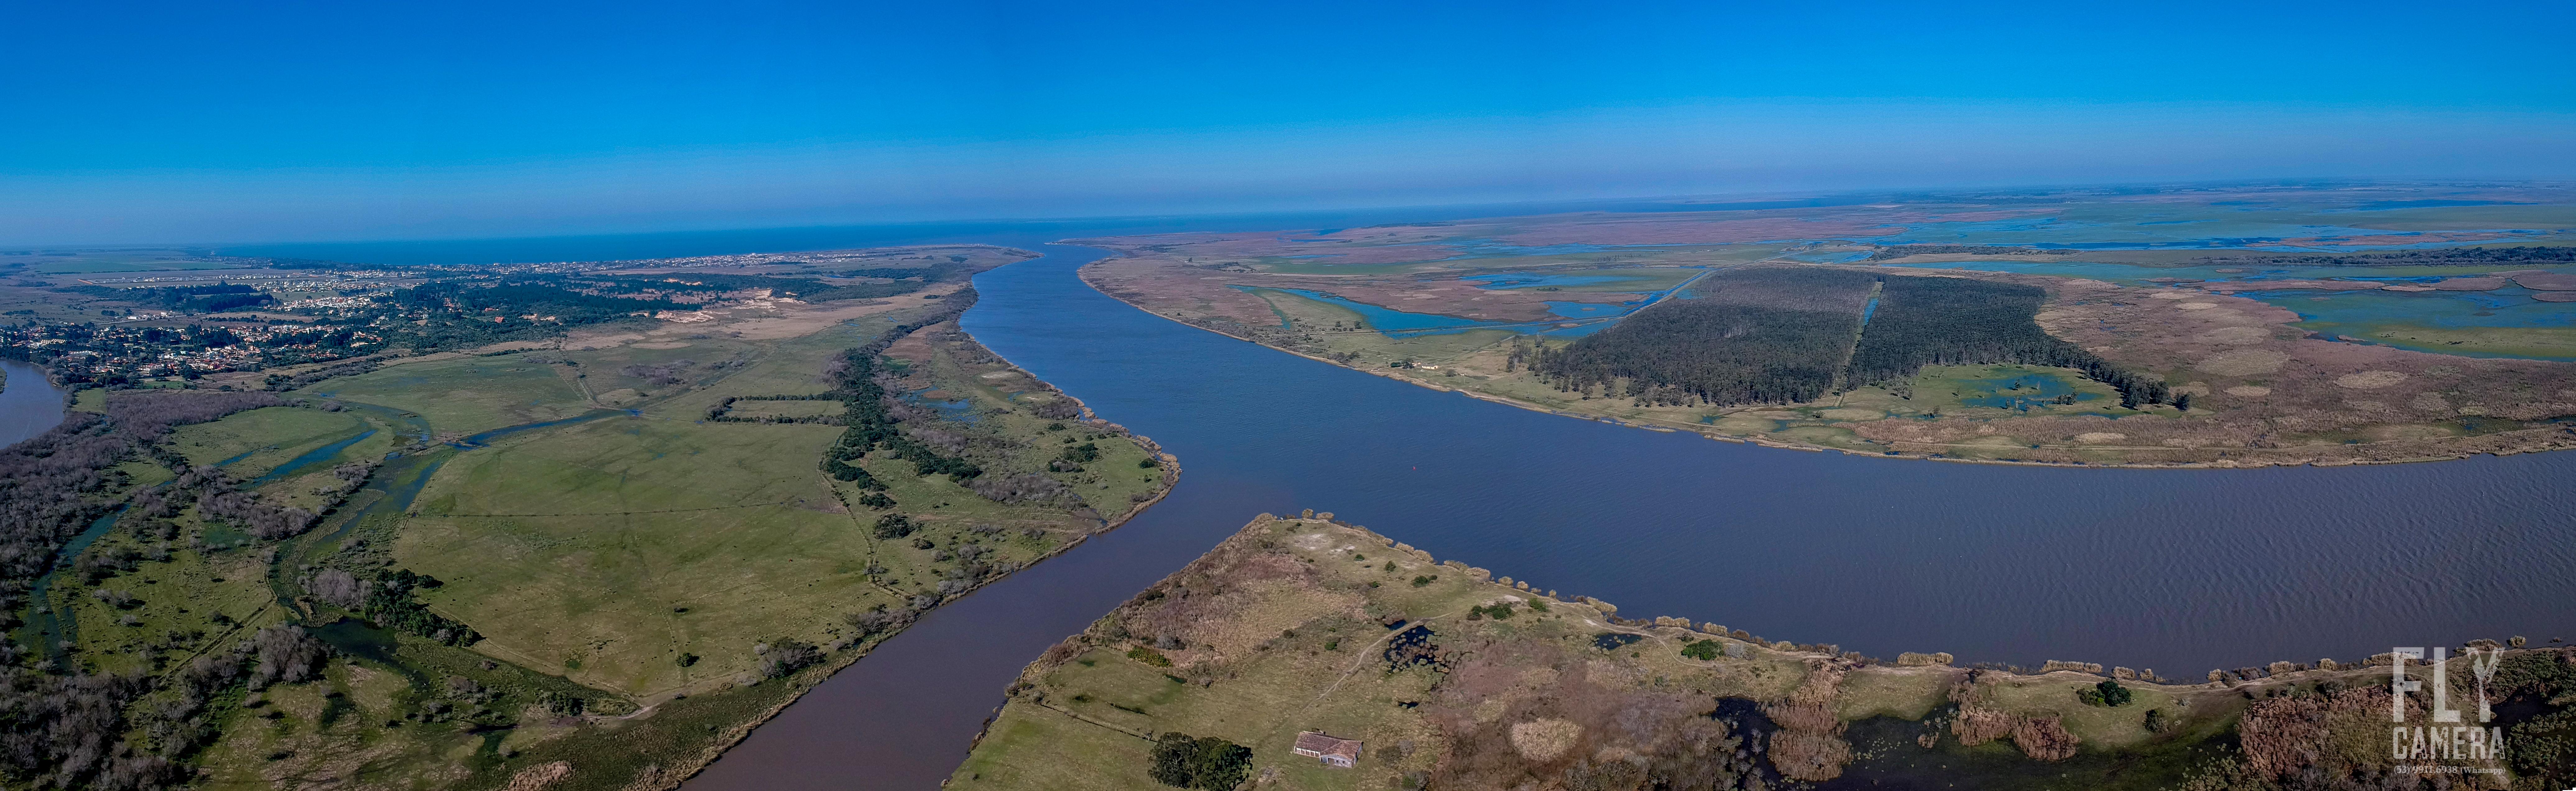 Panorama_Canal_sao_gonçalo_arroio_Pelota